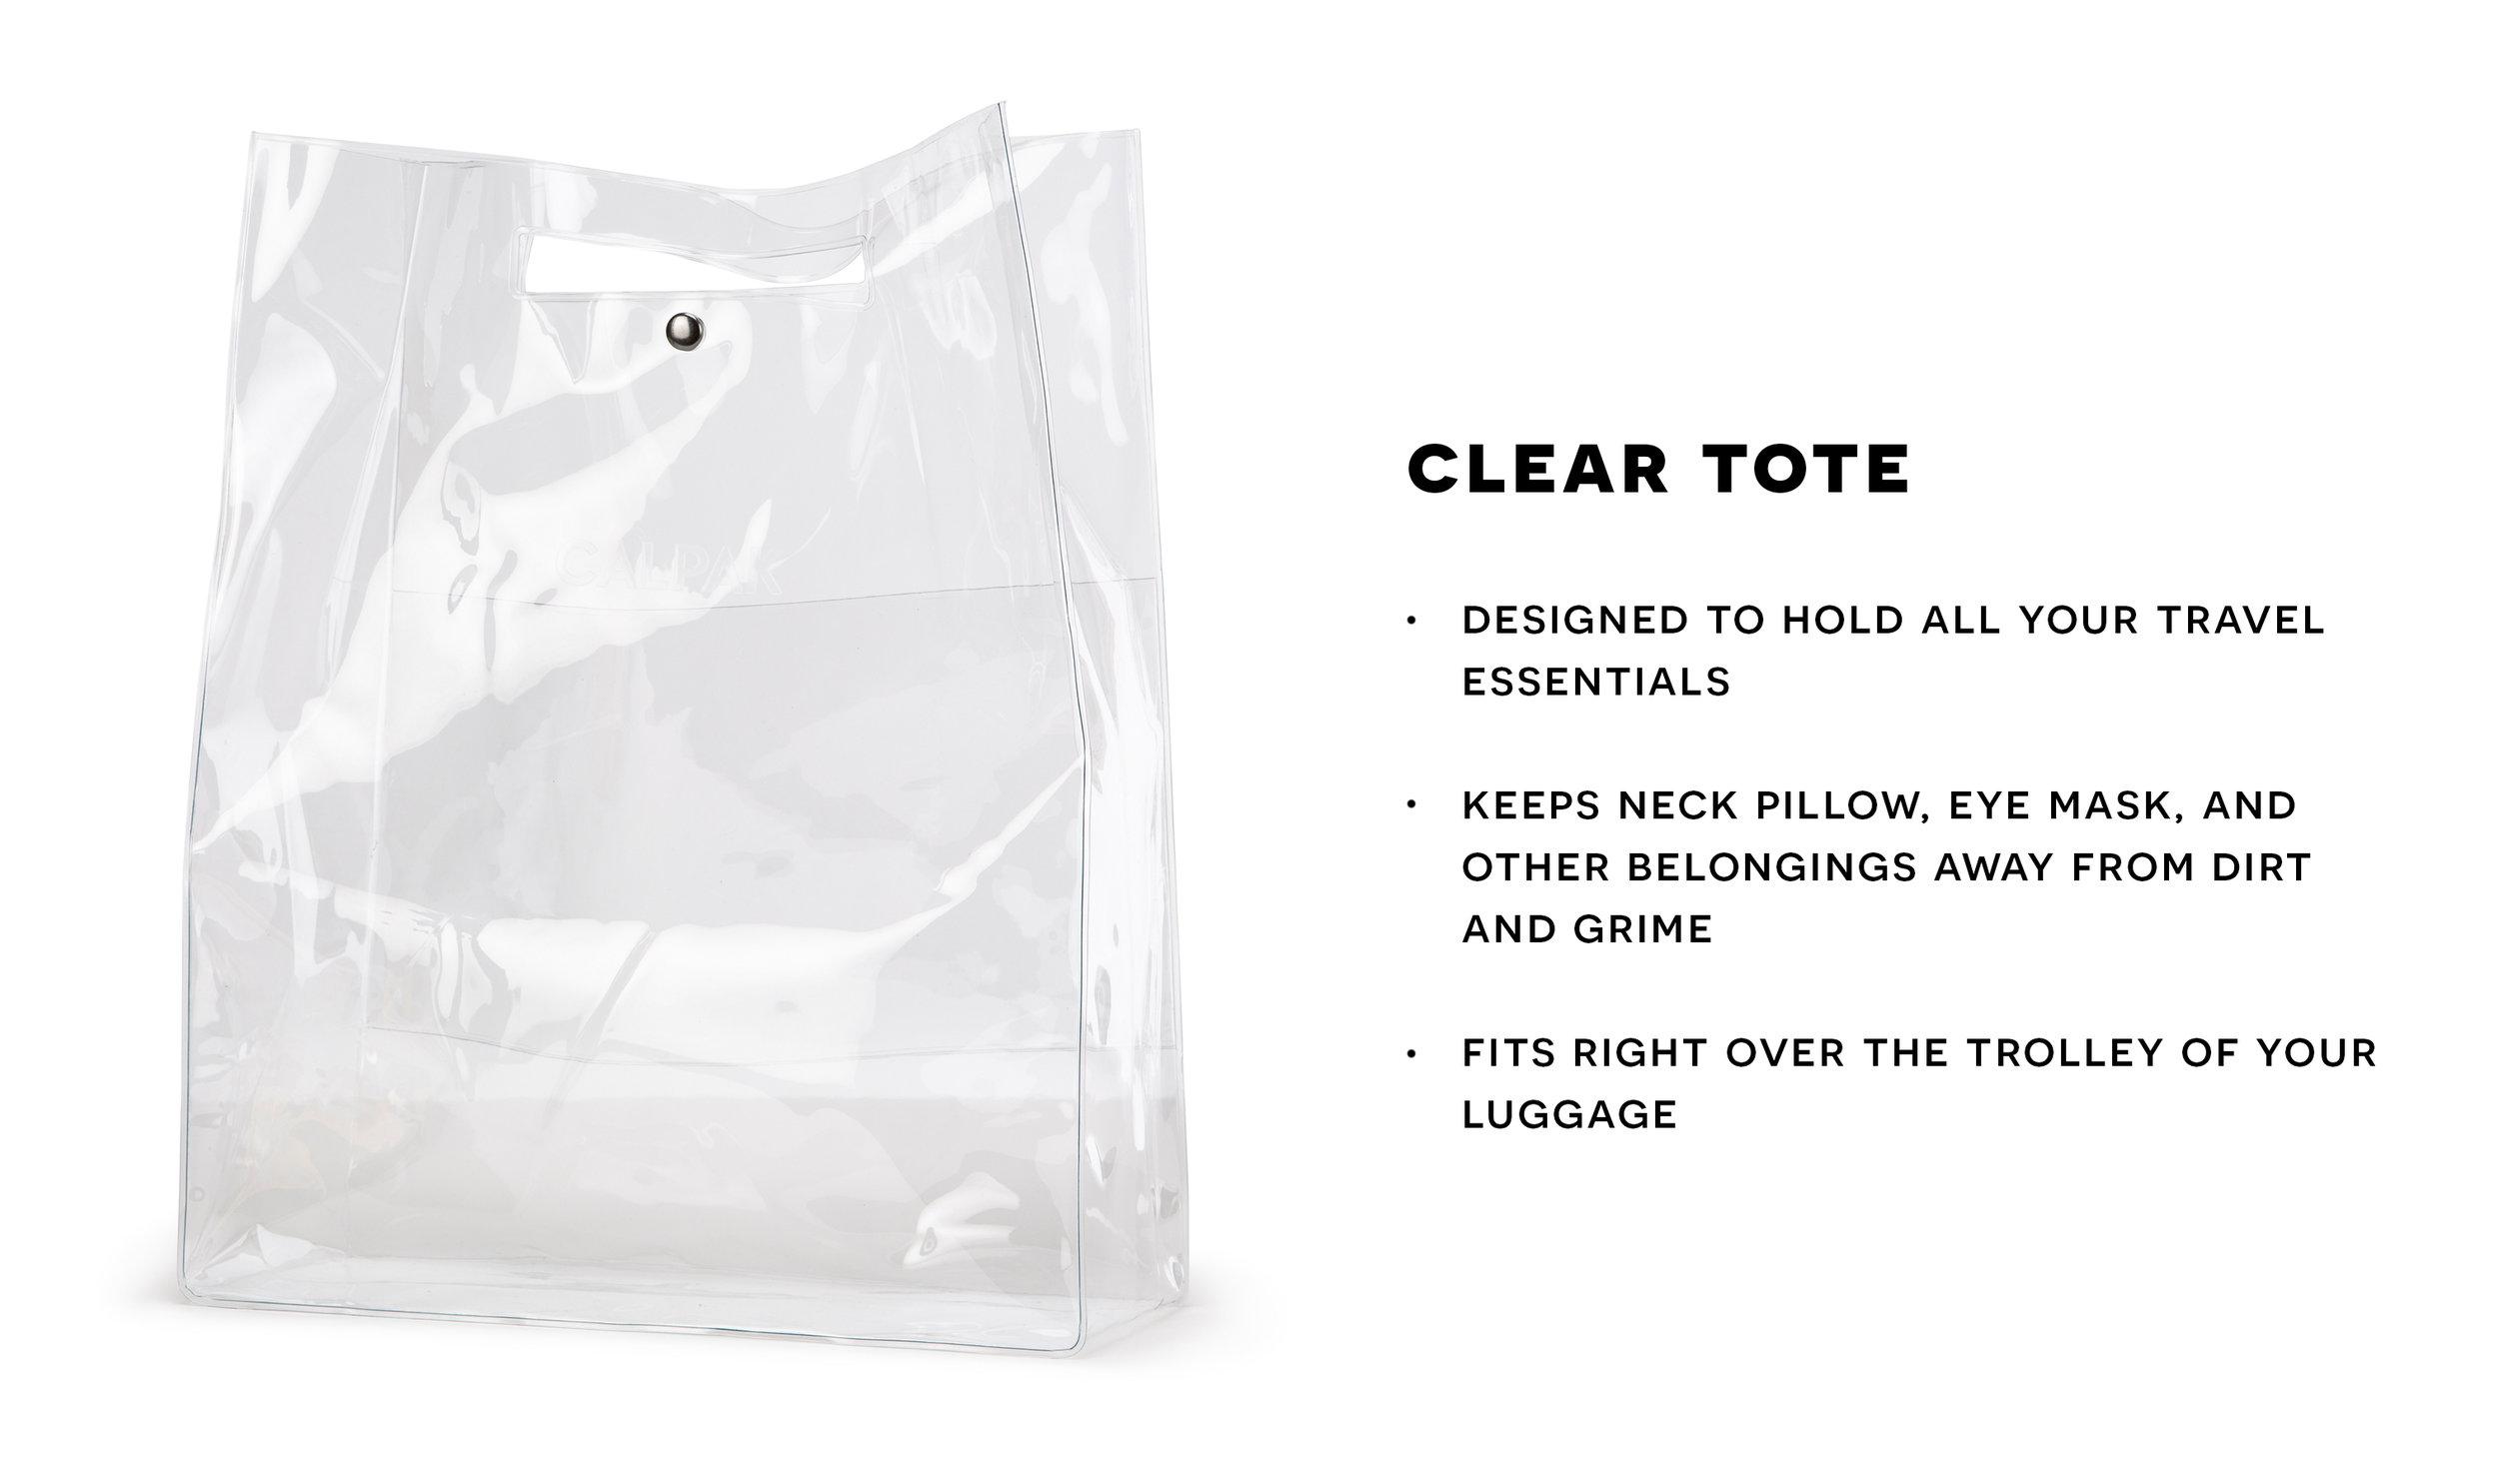 CLEAR TOTE copy.jpg